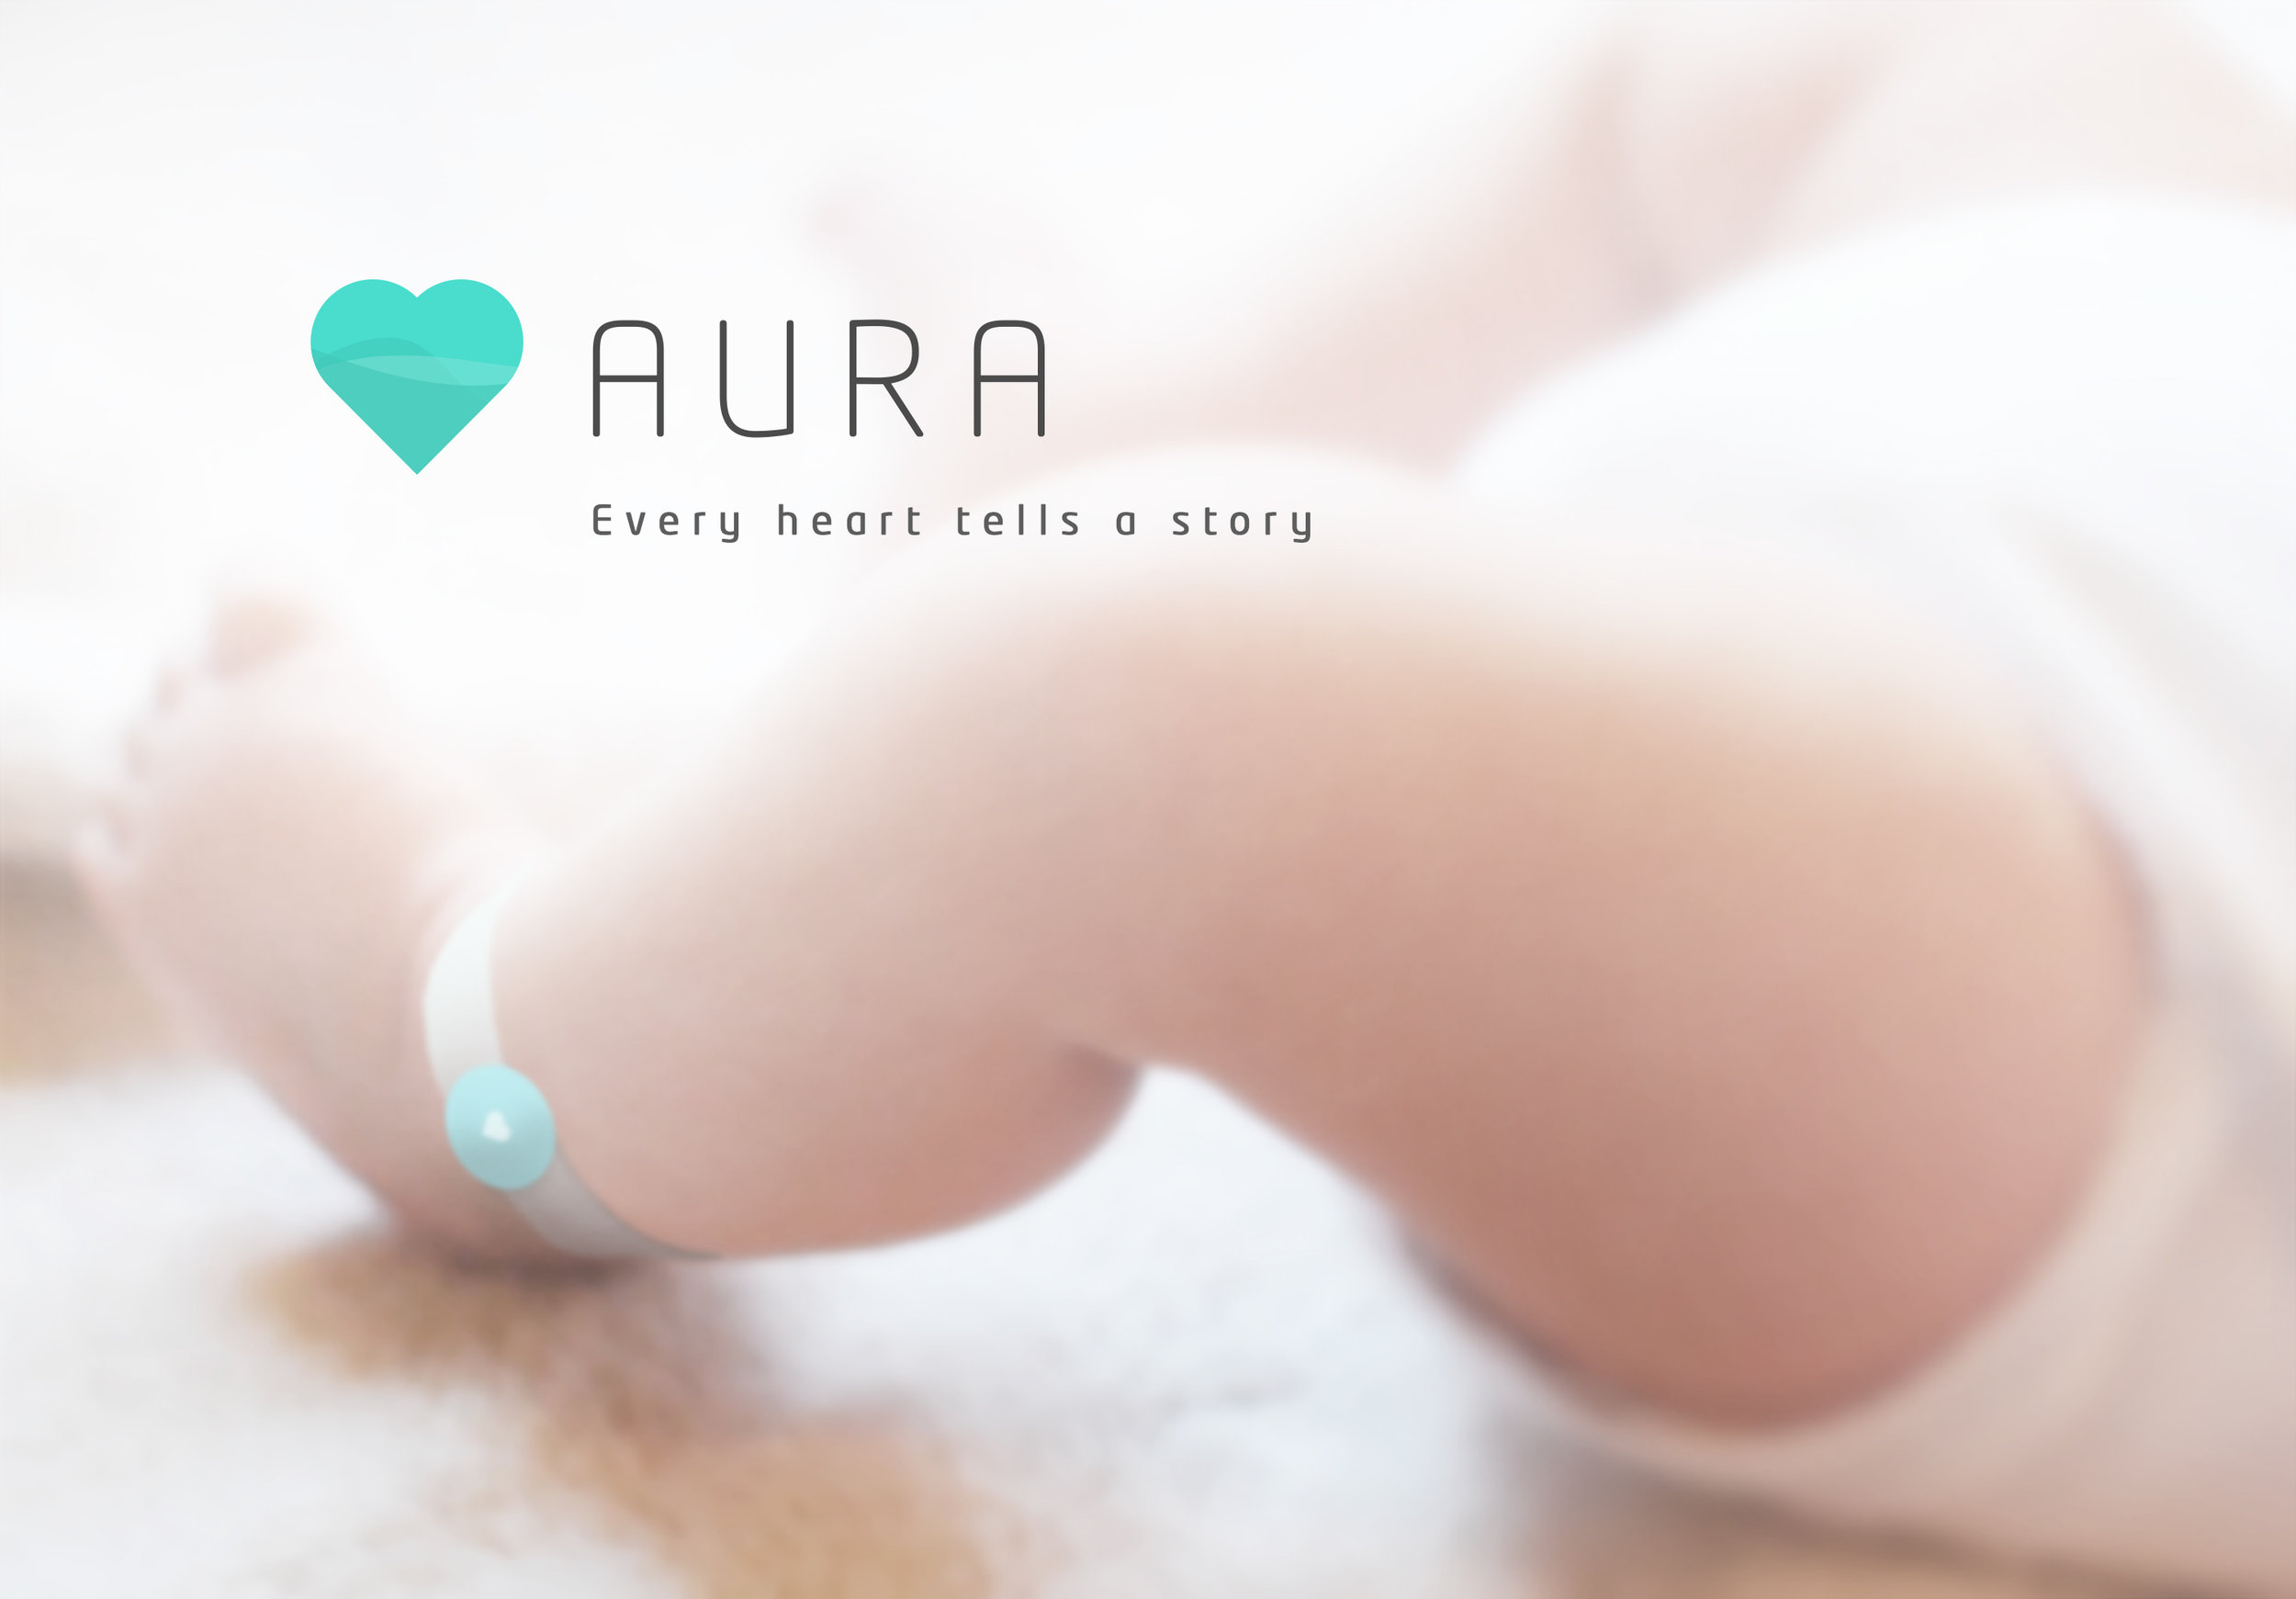 AuraTitle.jpg